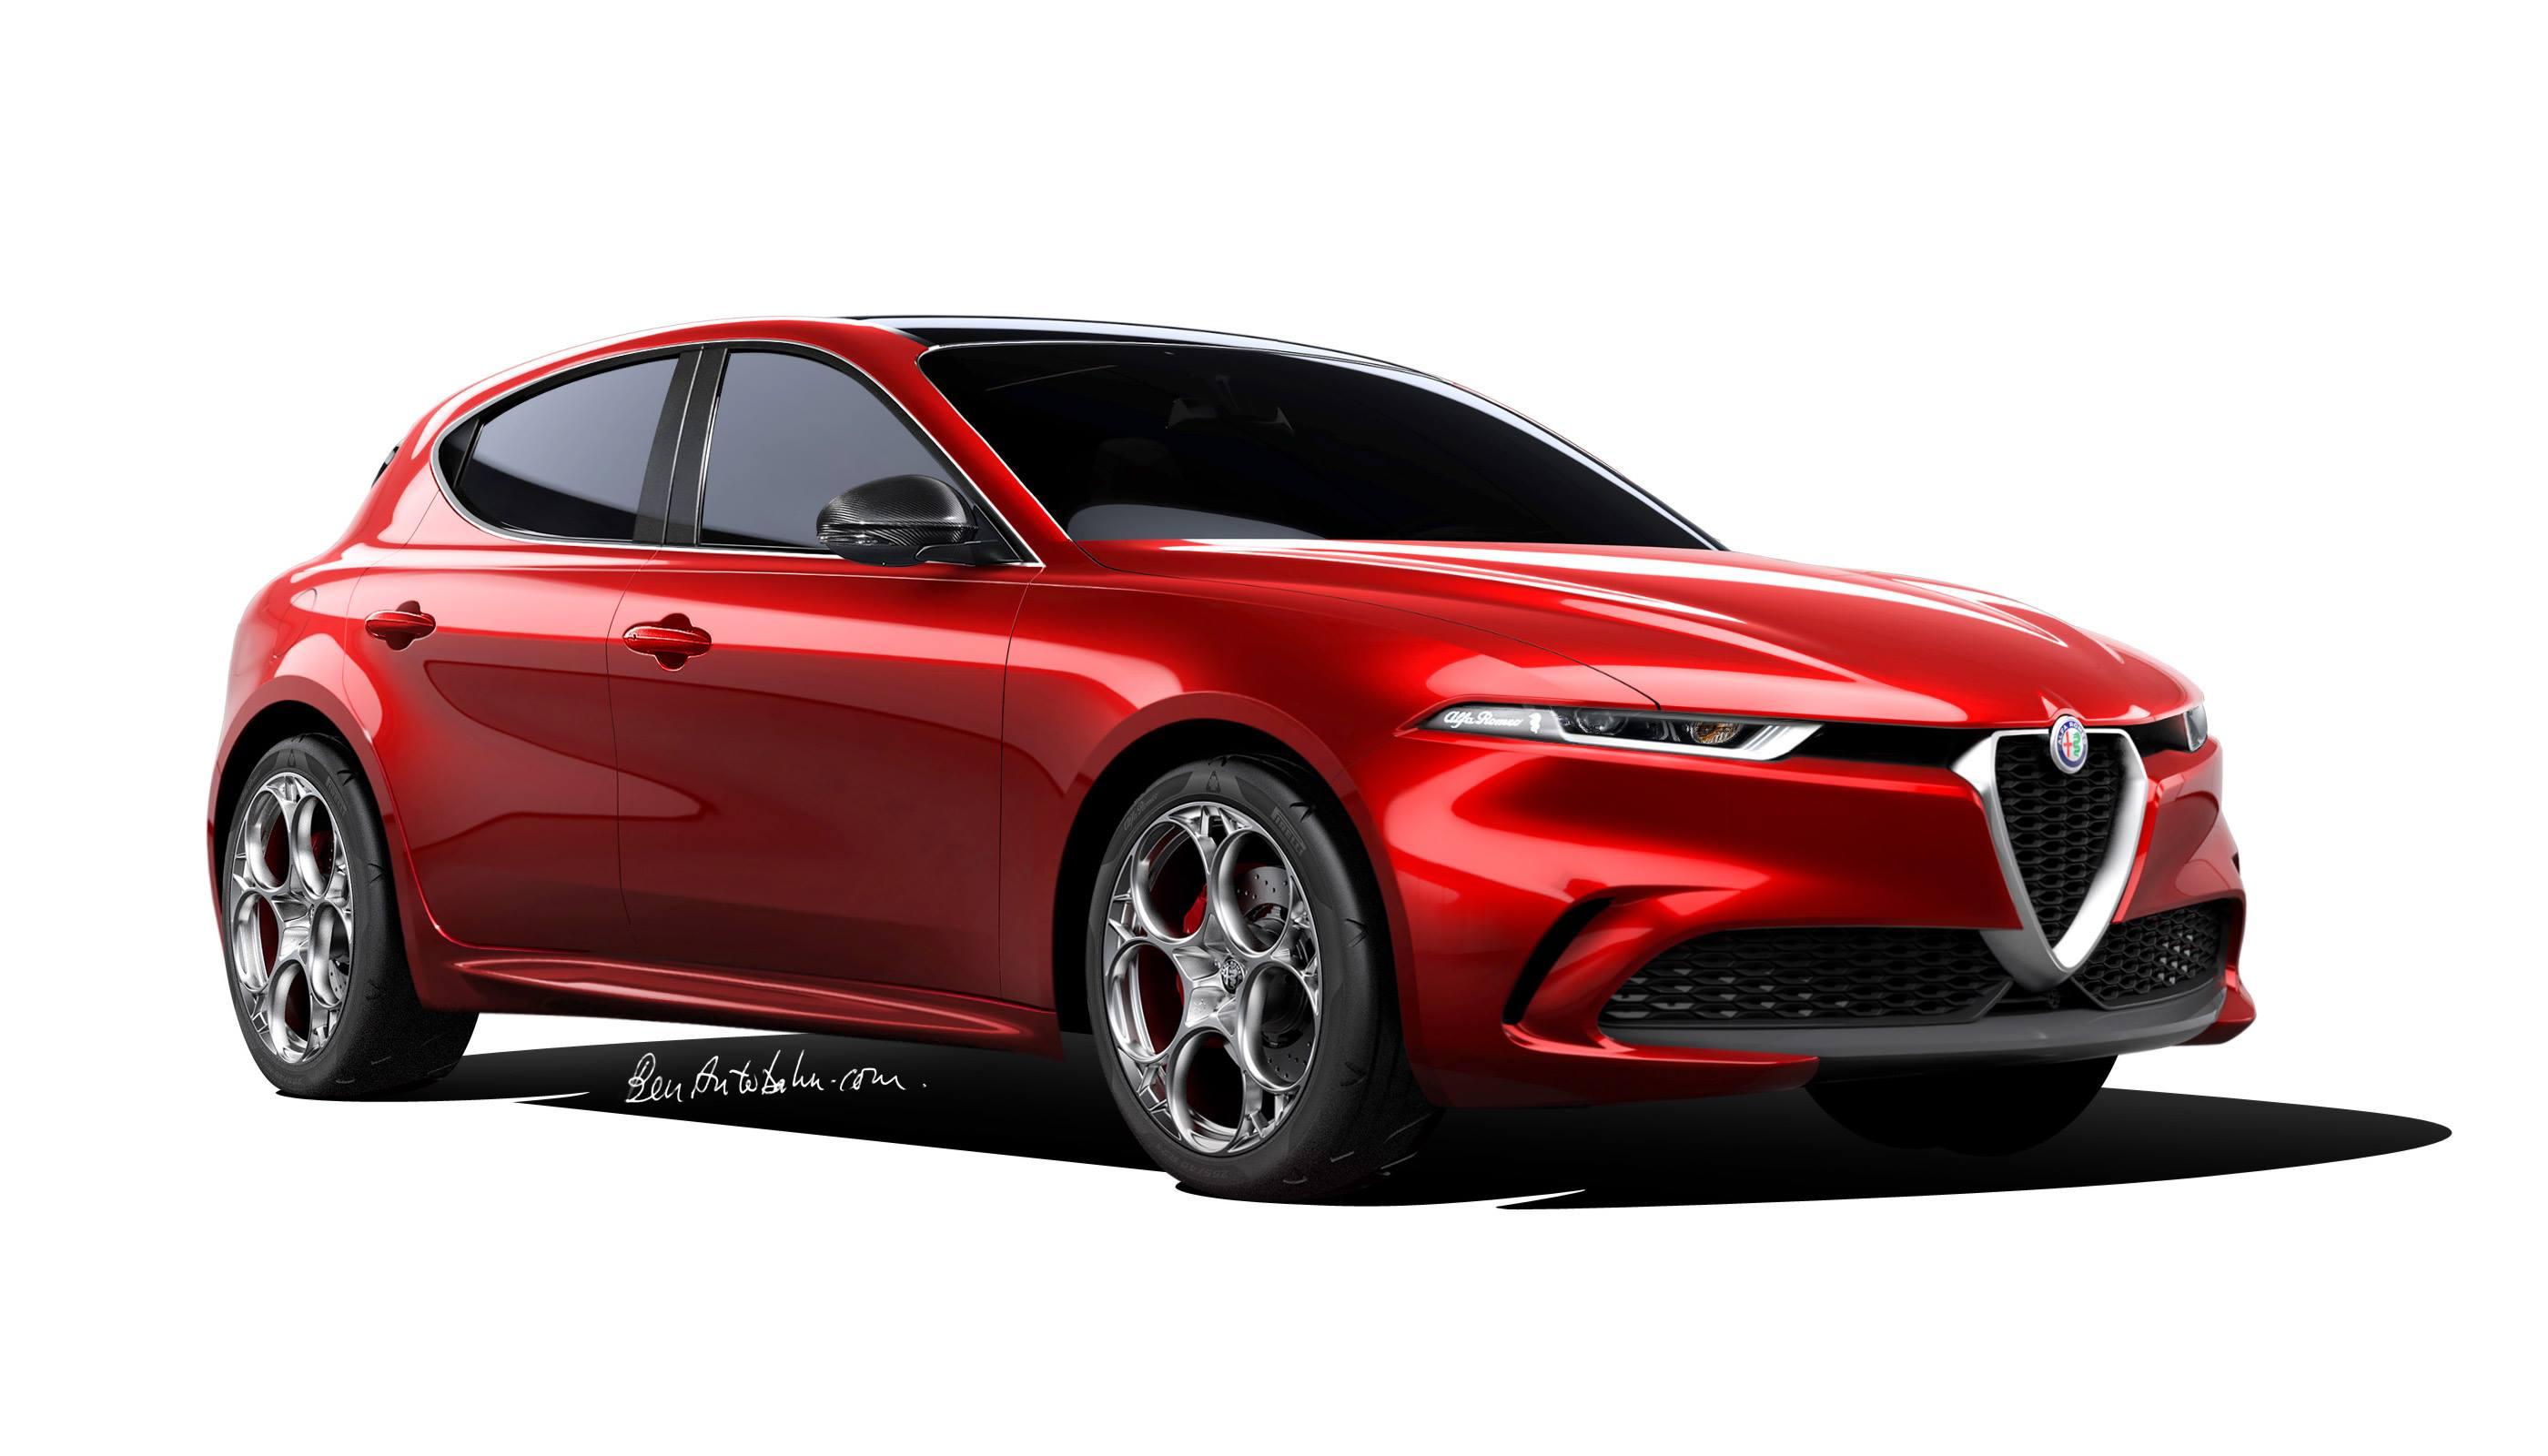 Next-gen Alfa Romeo Giulietta re-imagined! – BenAutobahn